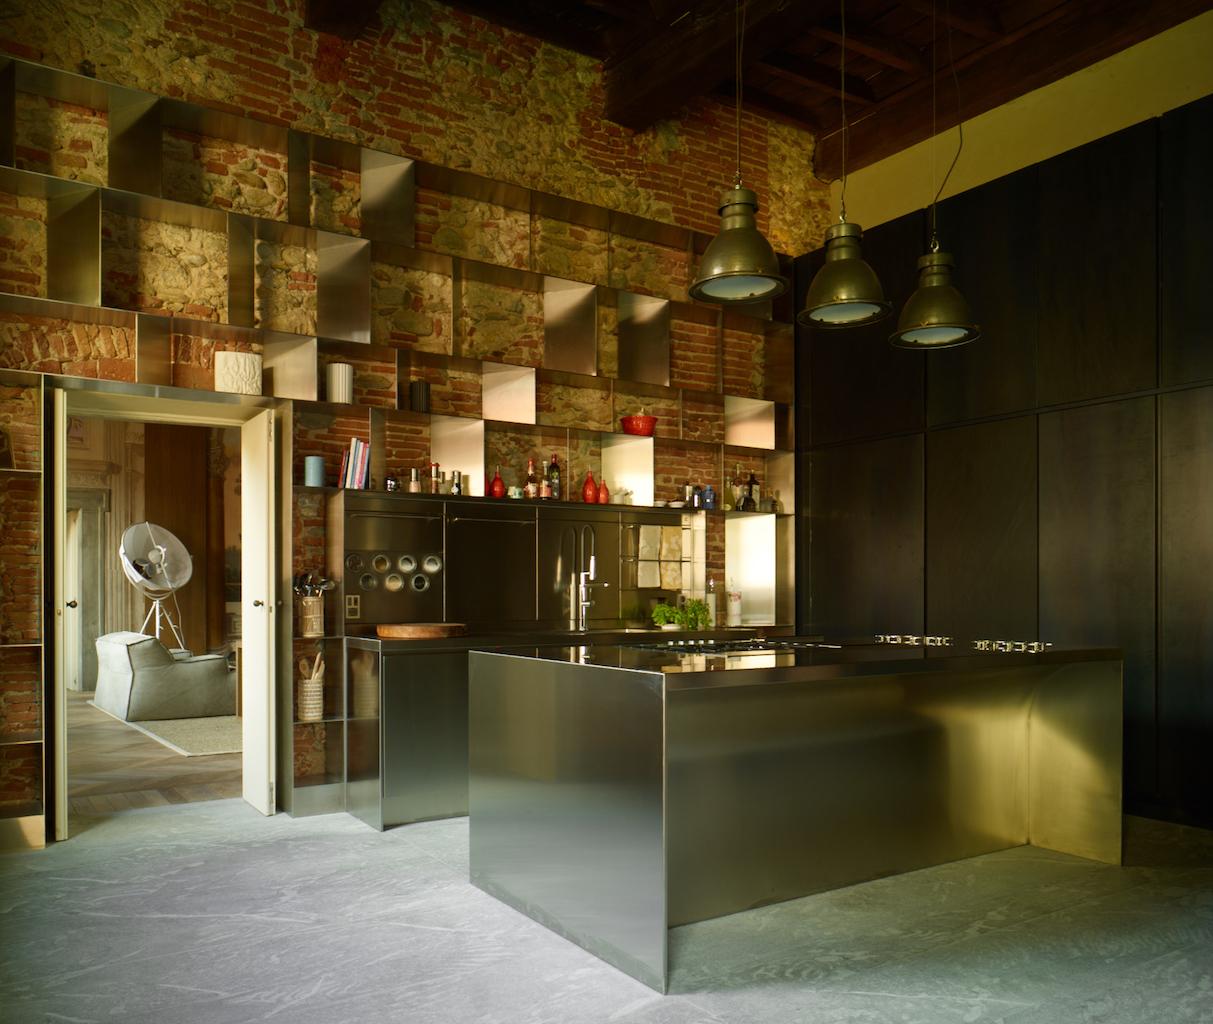 Da abimis una cucina industriale pensata per la casa - Cucina per casa ...